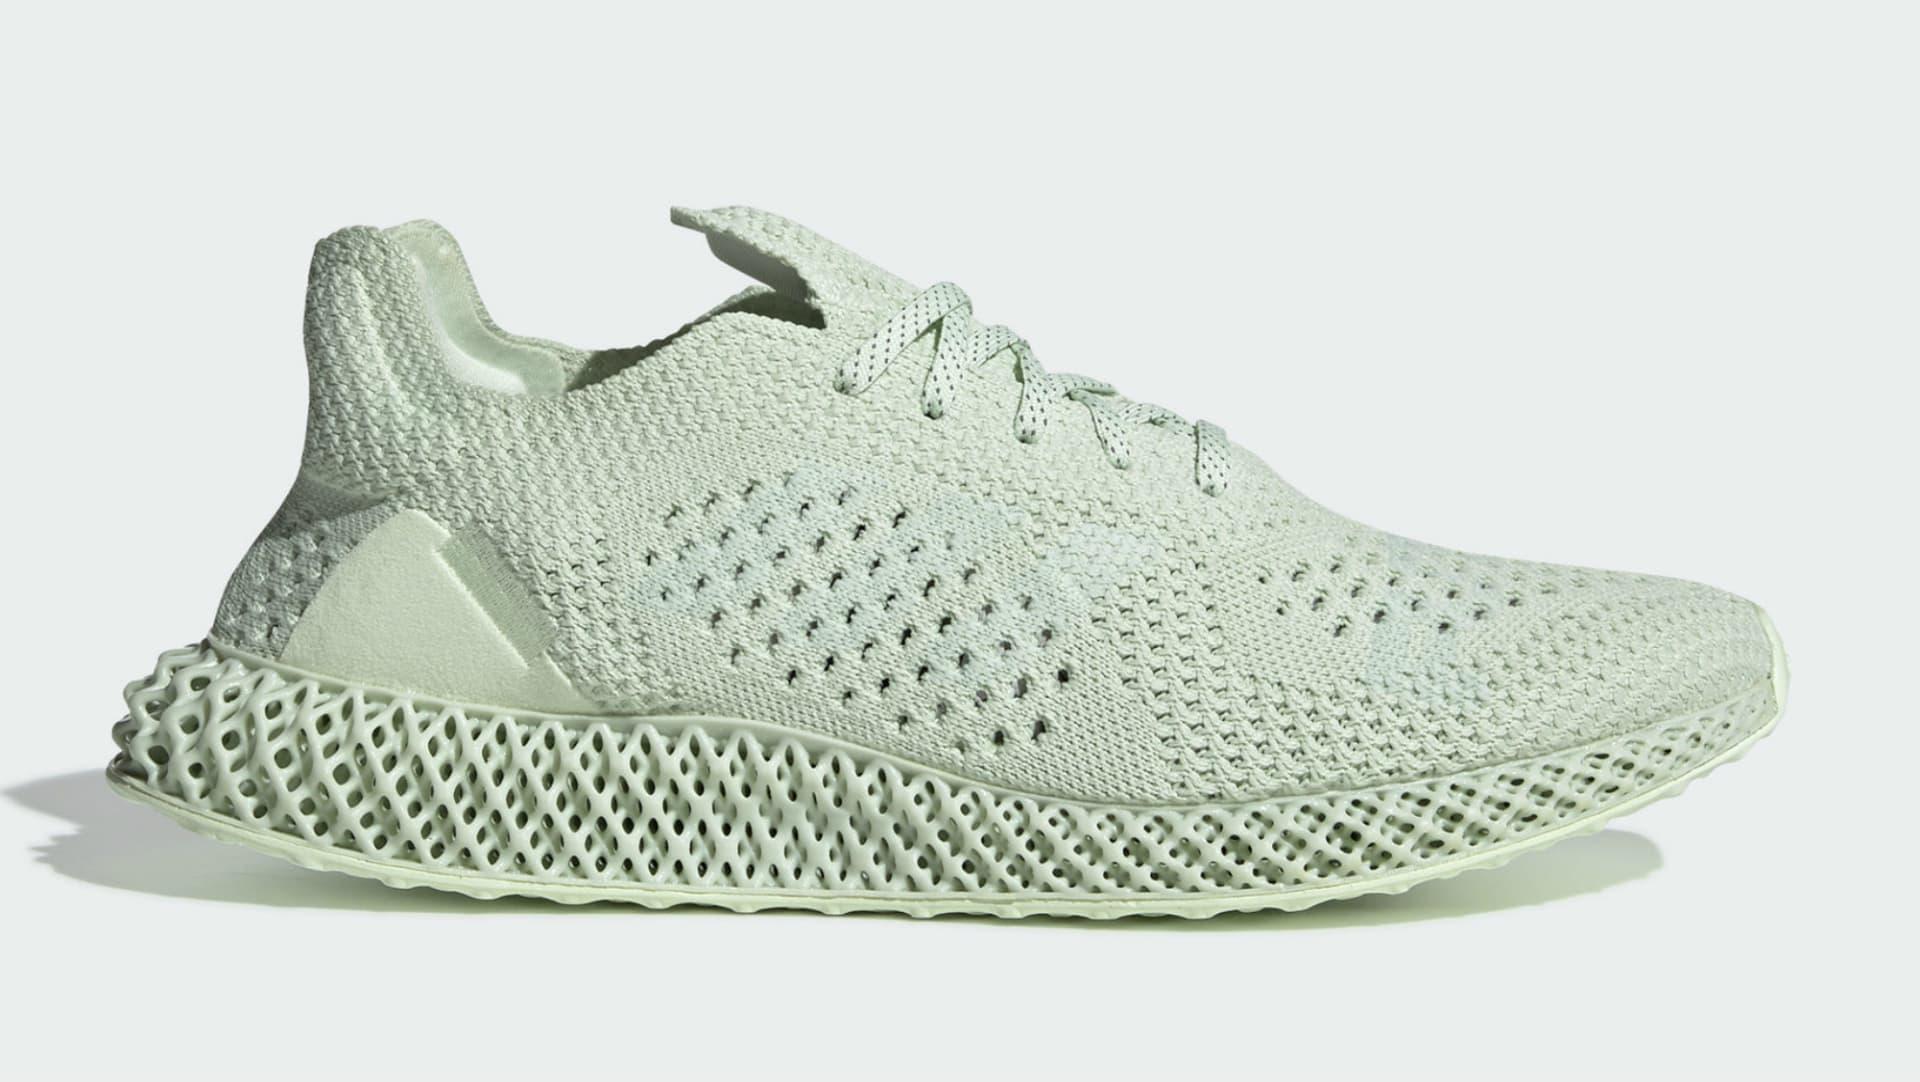 dff06cac337e 10. Daniel Arsham x Adidas Futurecraft 4D